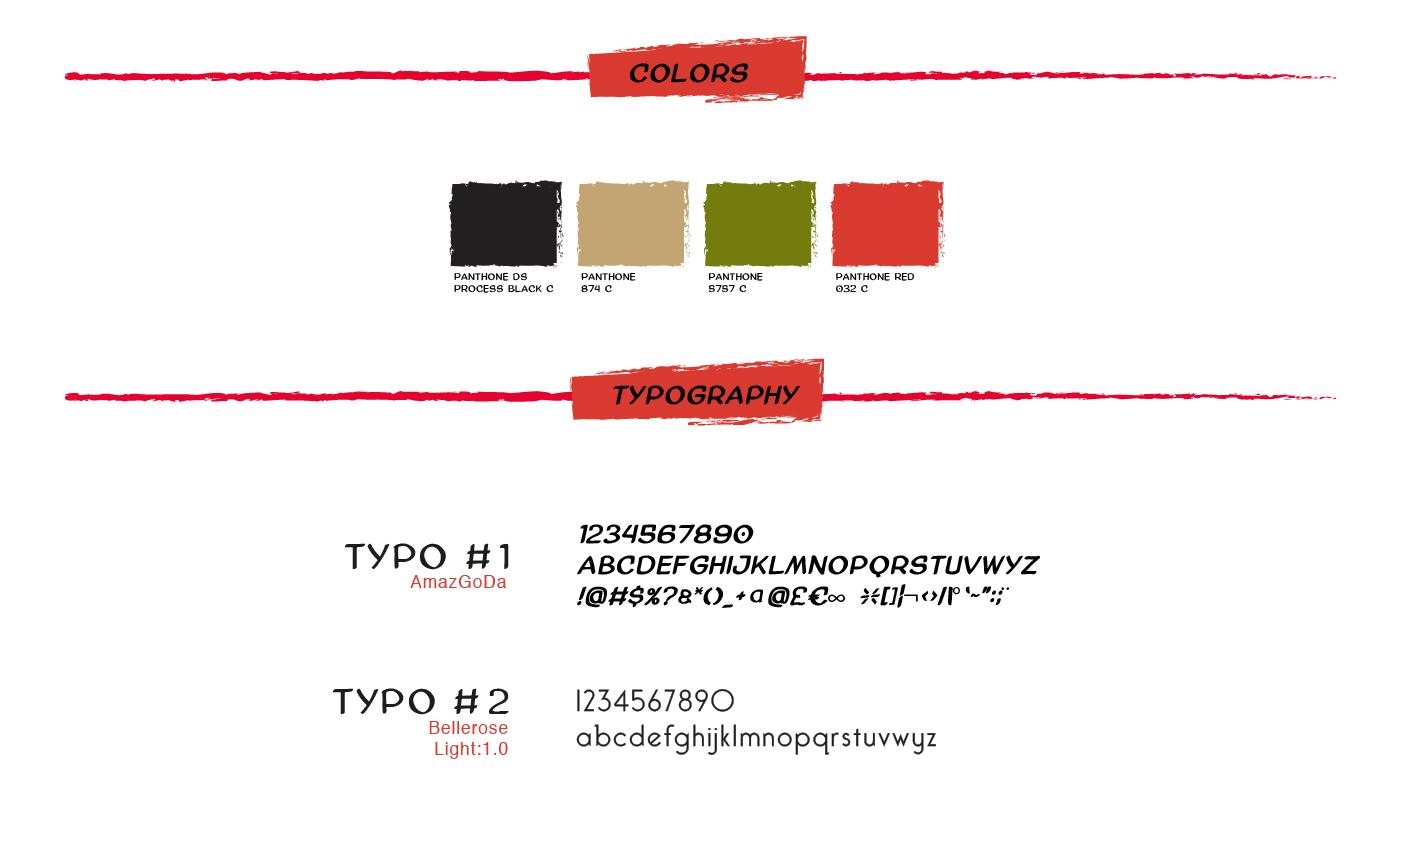 3-pisa-pizza_restaurant-couleurs_typographie.jpg